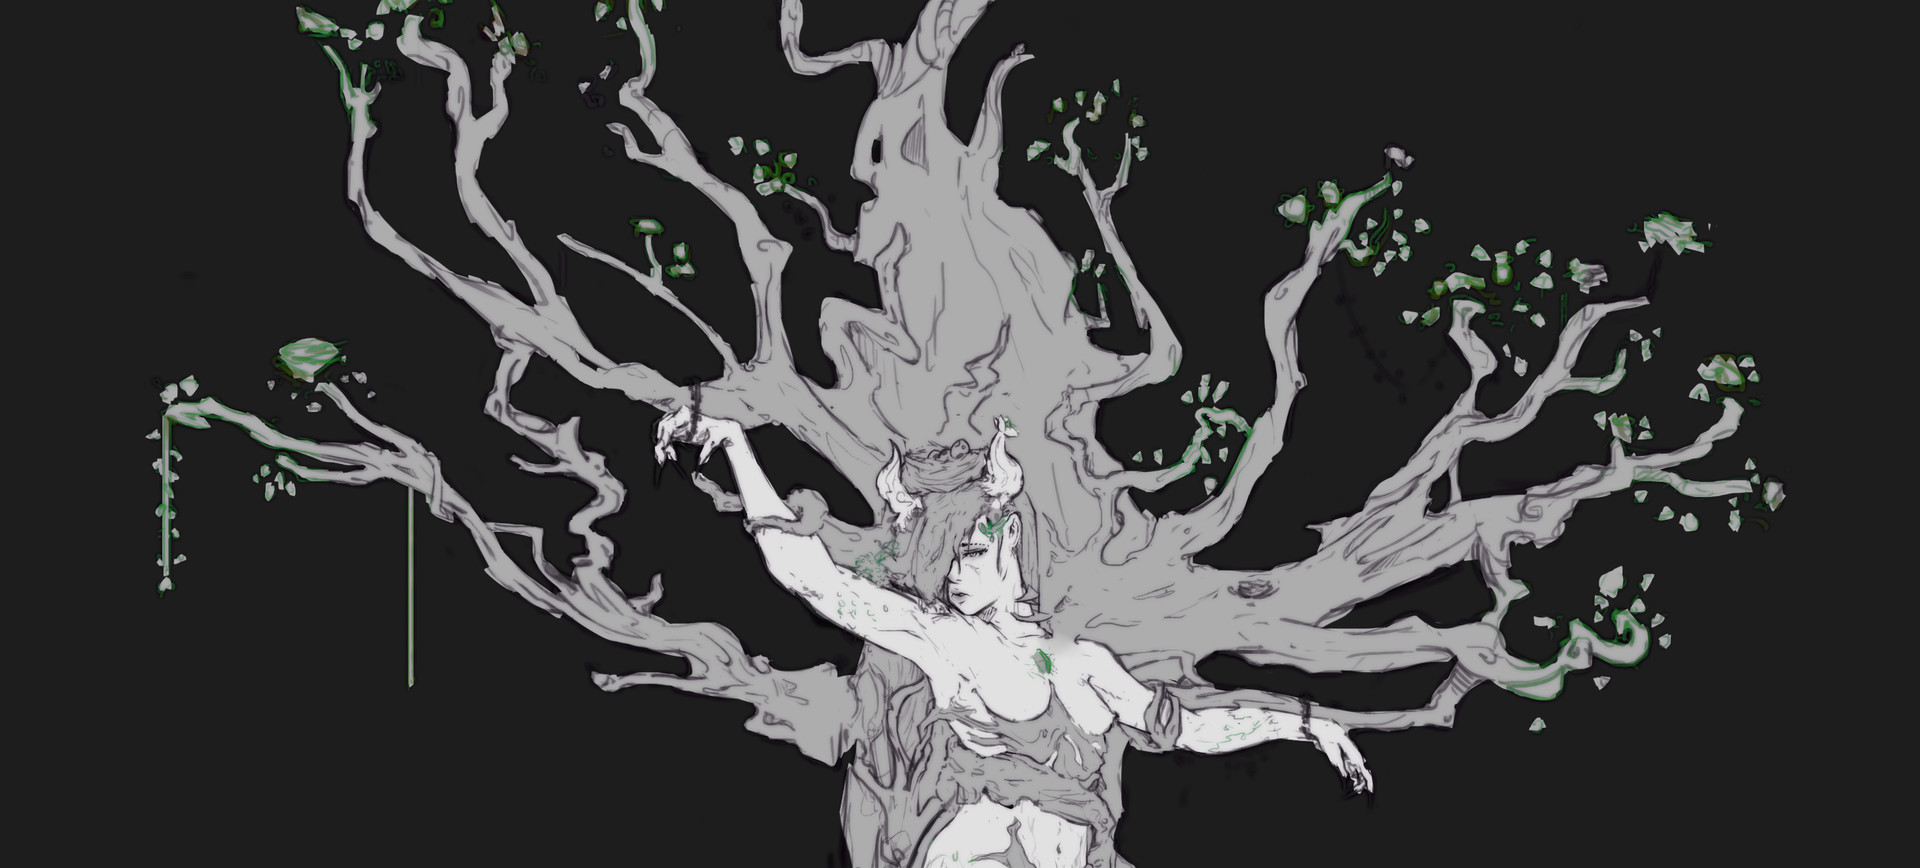 Boyan kazalov treegirlsketchcover